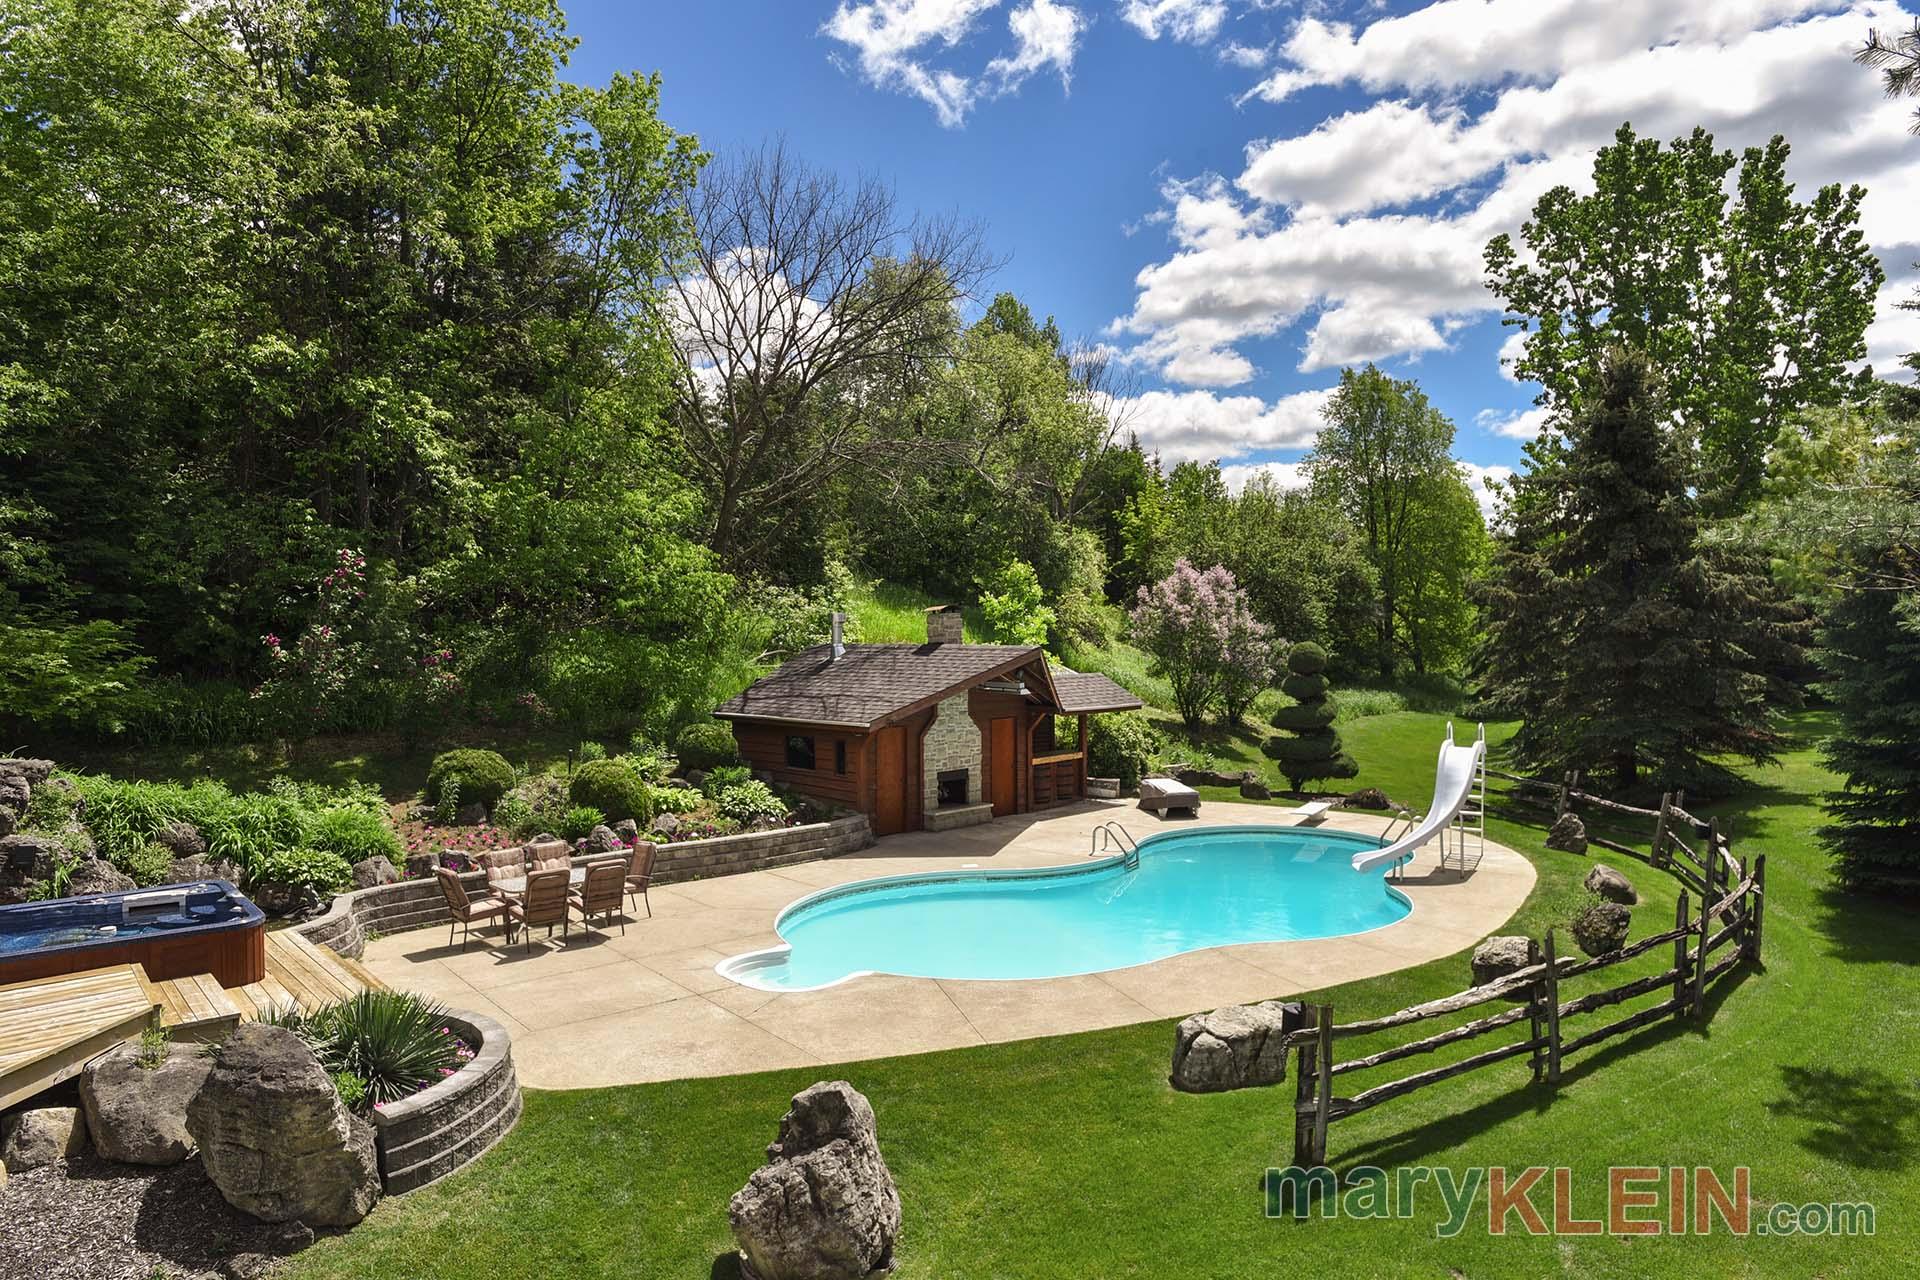 oasis, inground pool, hot tub, outdoor fireplace